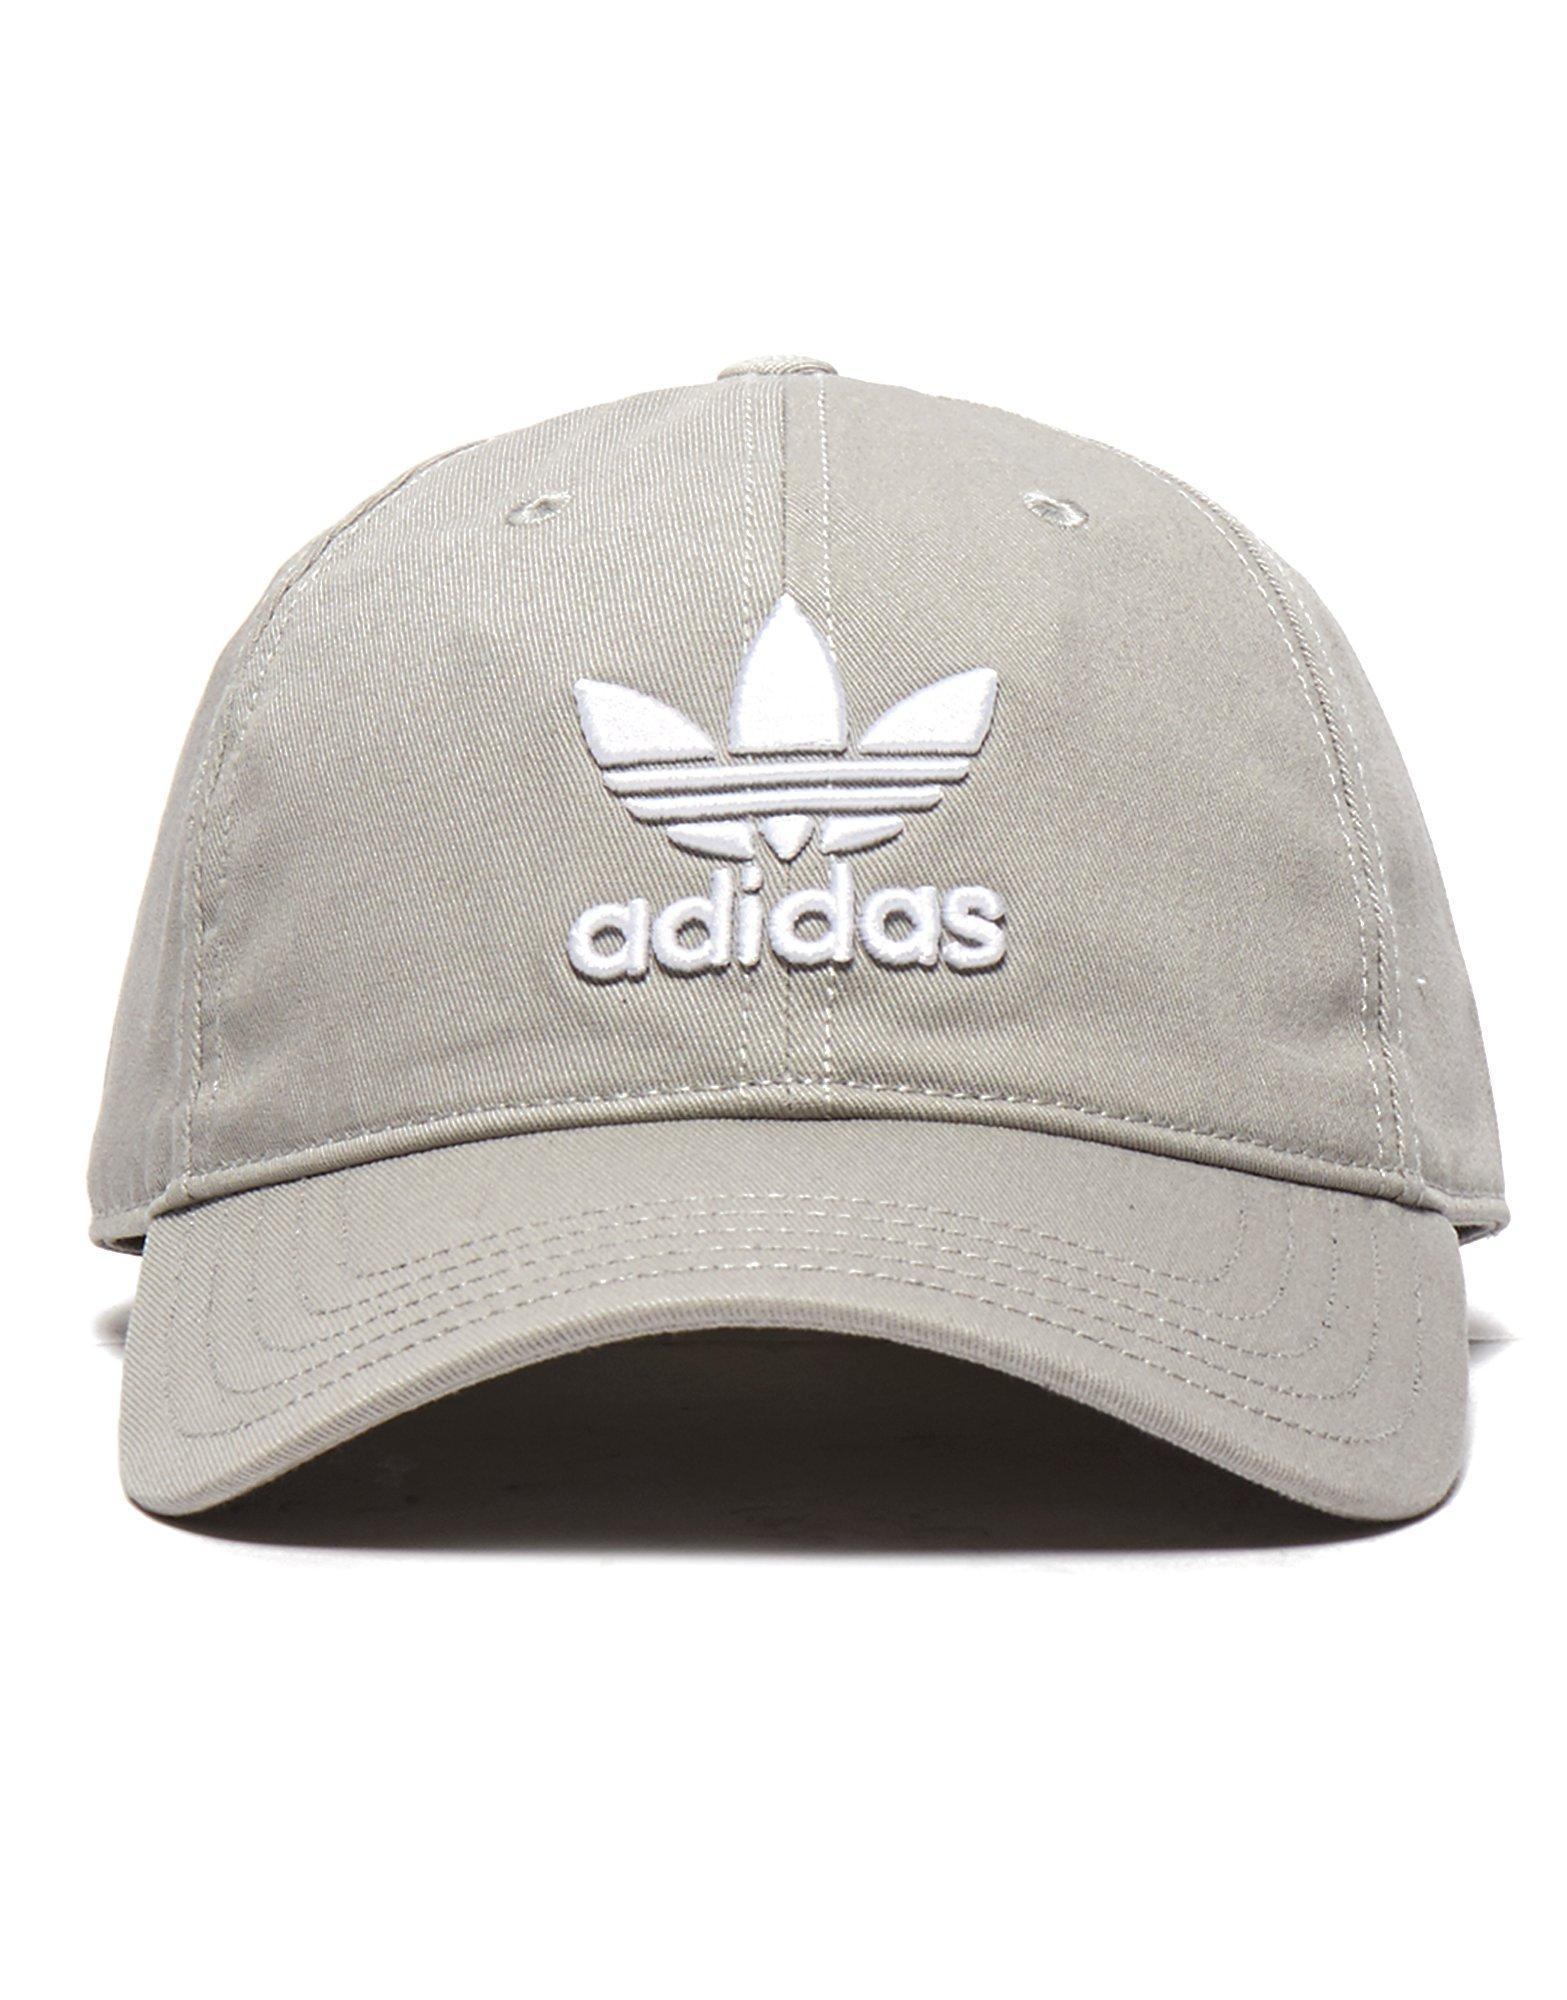 adidas Originals Trefoil Classic Cap in Gray for Men - Lyst c6d46a13c611